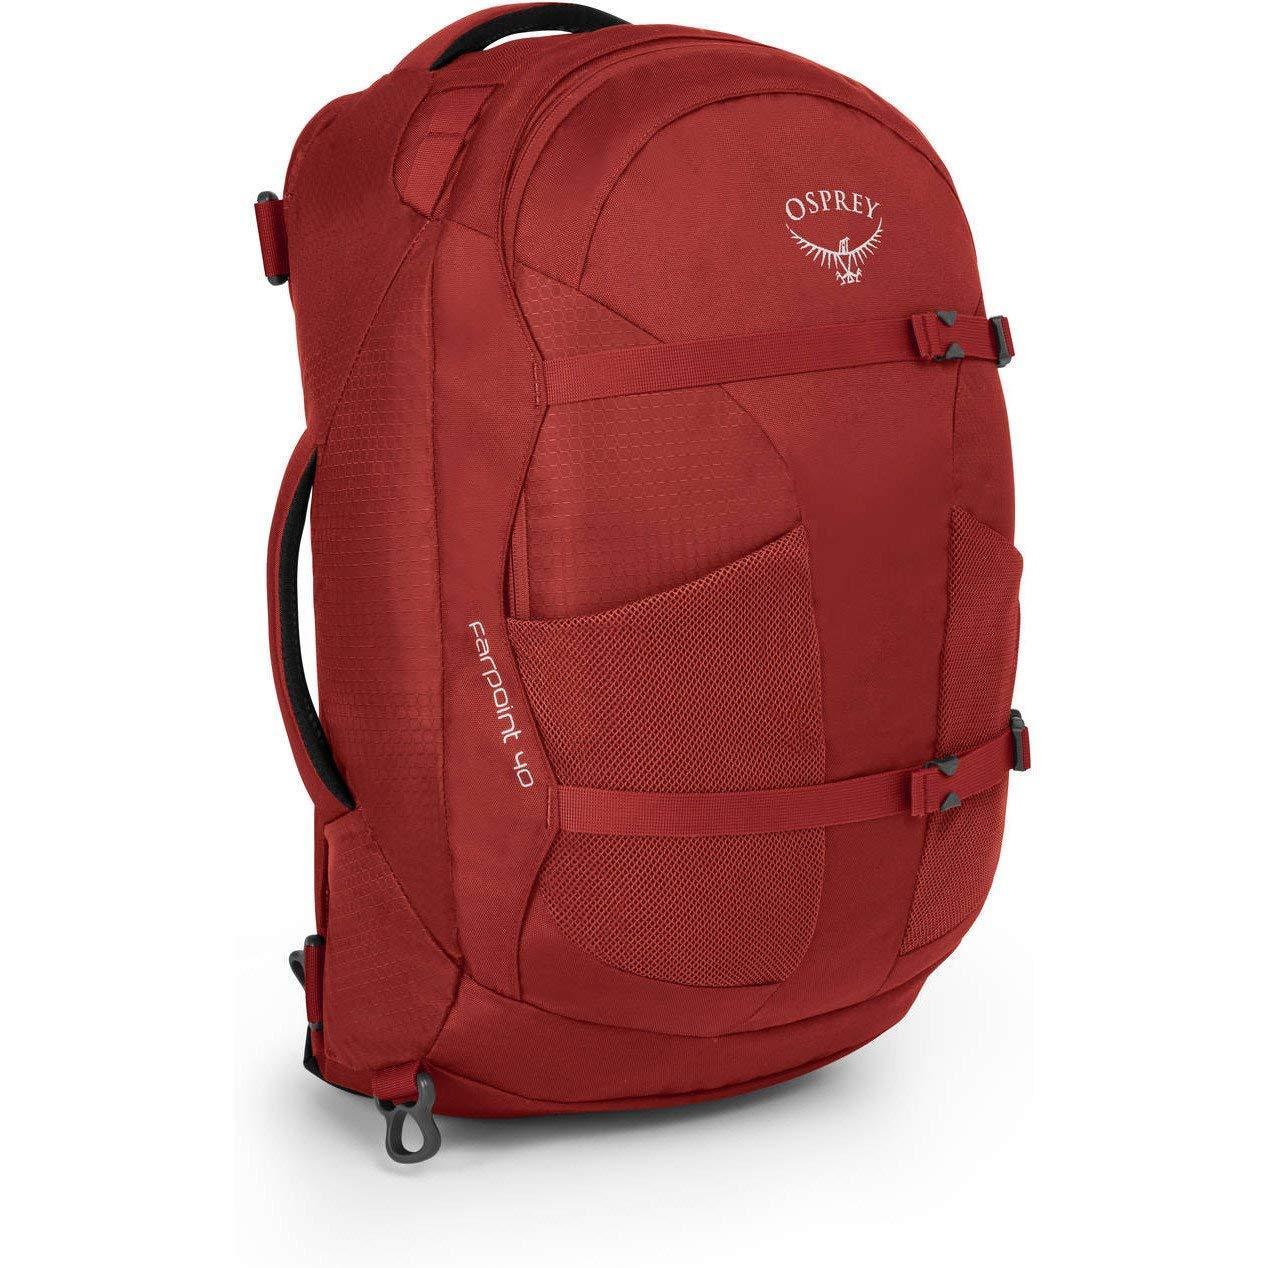 Osprey Packs Farpoint 40 Travel Backpack, Jasper Red, Small/Medium